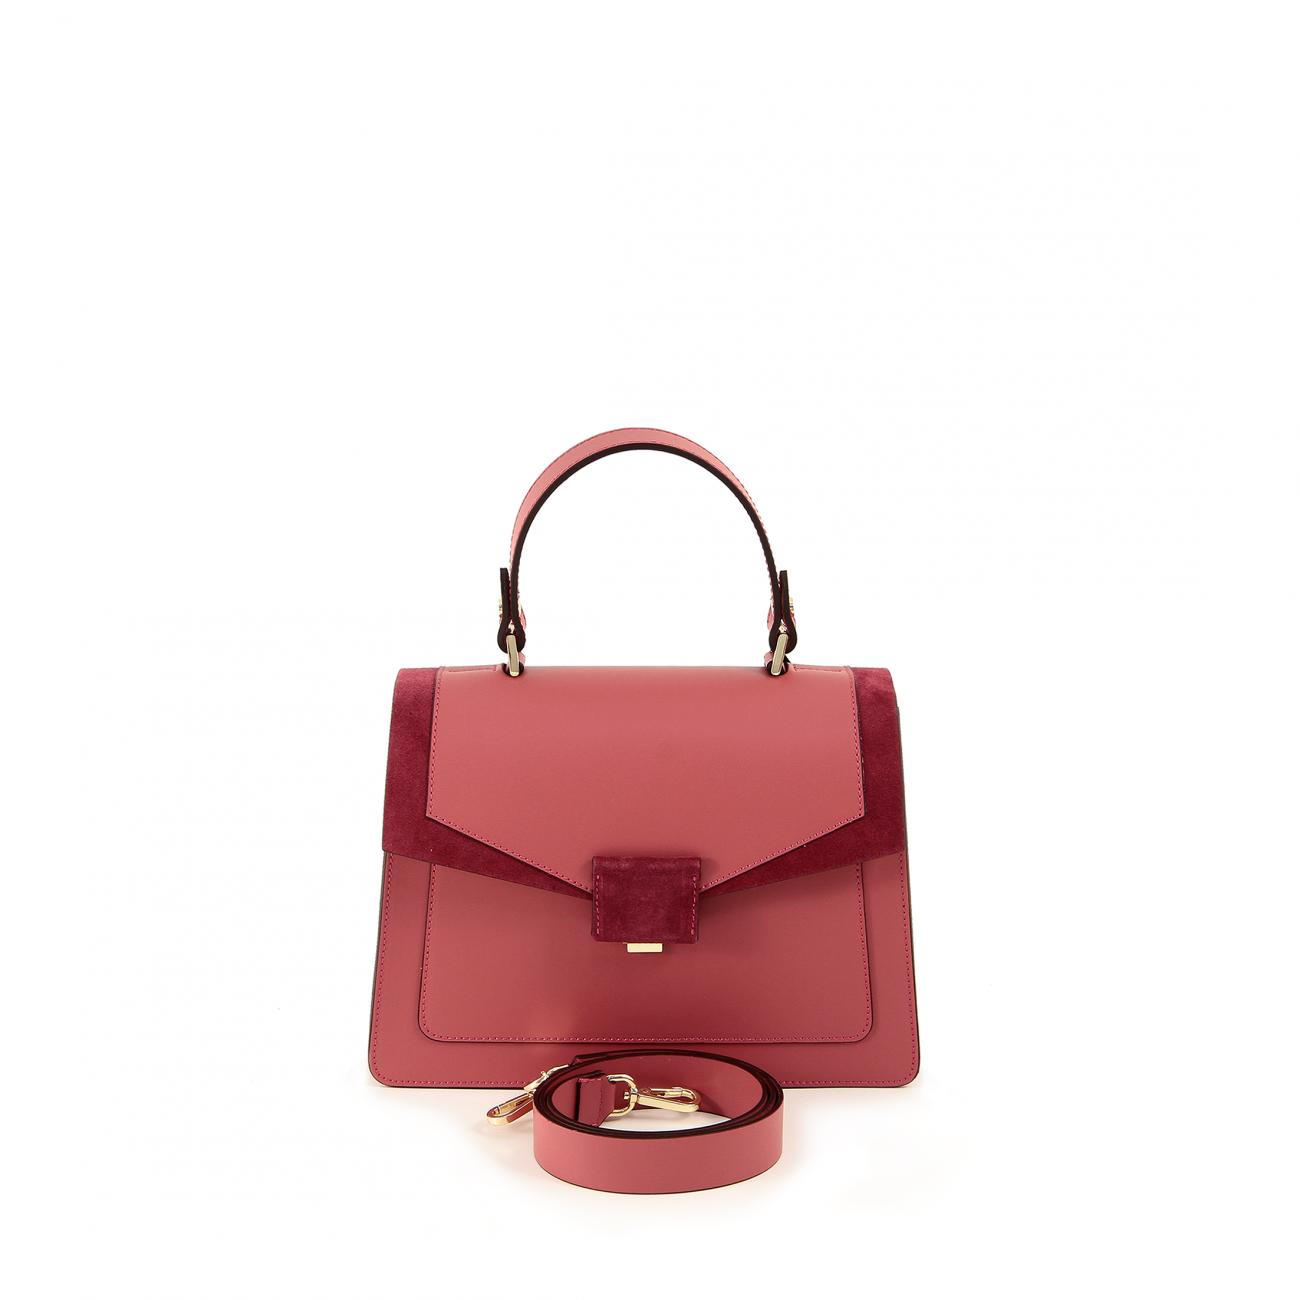 Genuine leather bag - calf. Gold colored metal accessories. Handle height 11  cm. Detachable shoulder strap. Snap closure. Internal pocket with zipper. 99af779360b